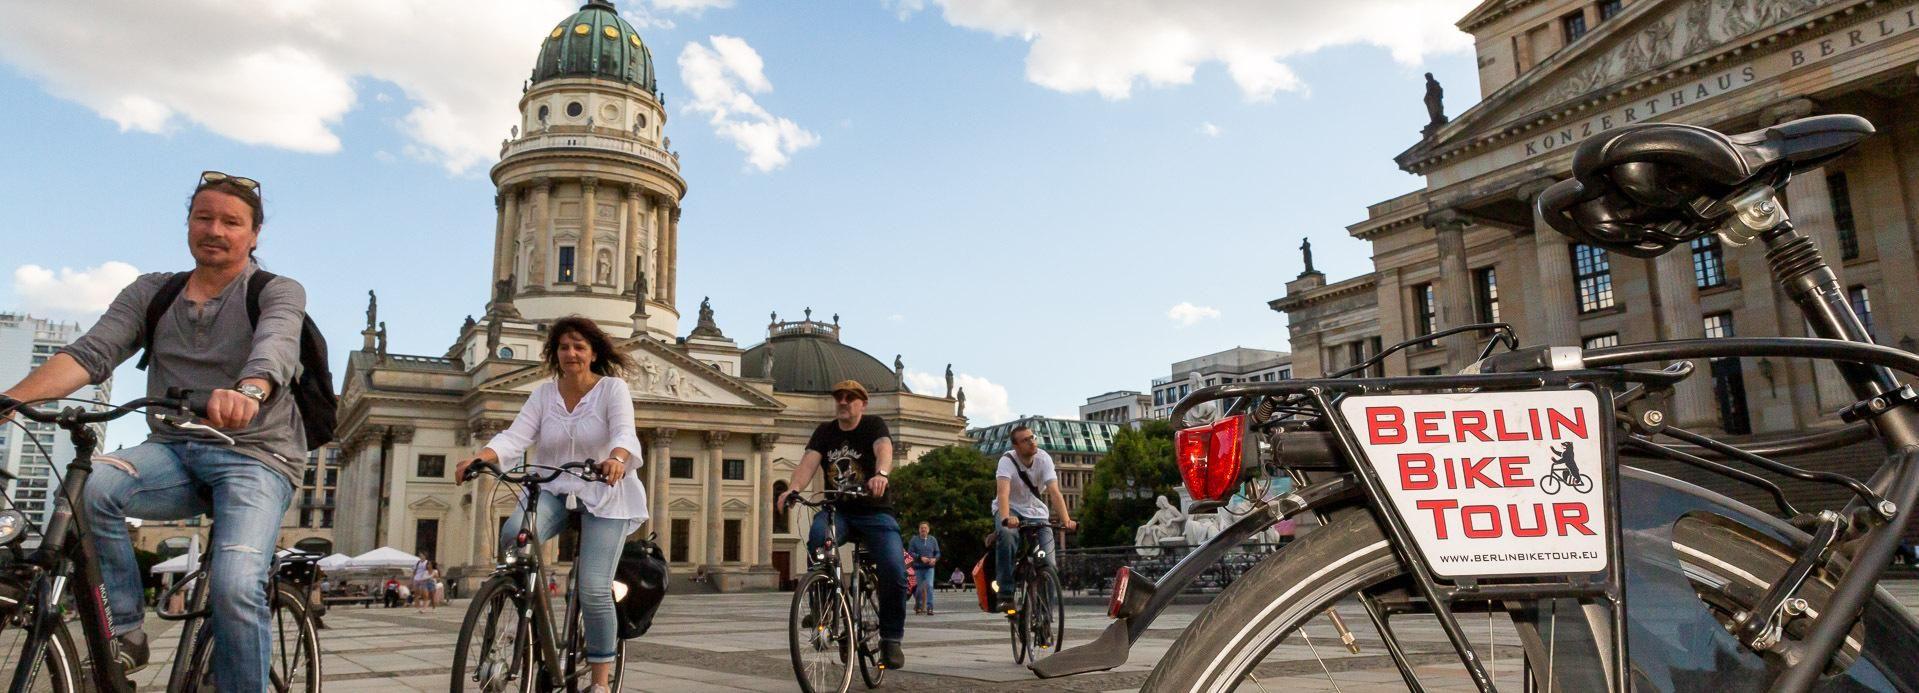 Berlin: Small Group Bike Tour Through City Center